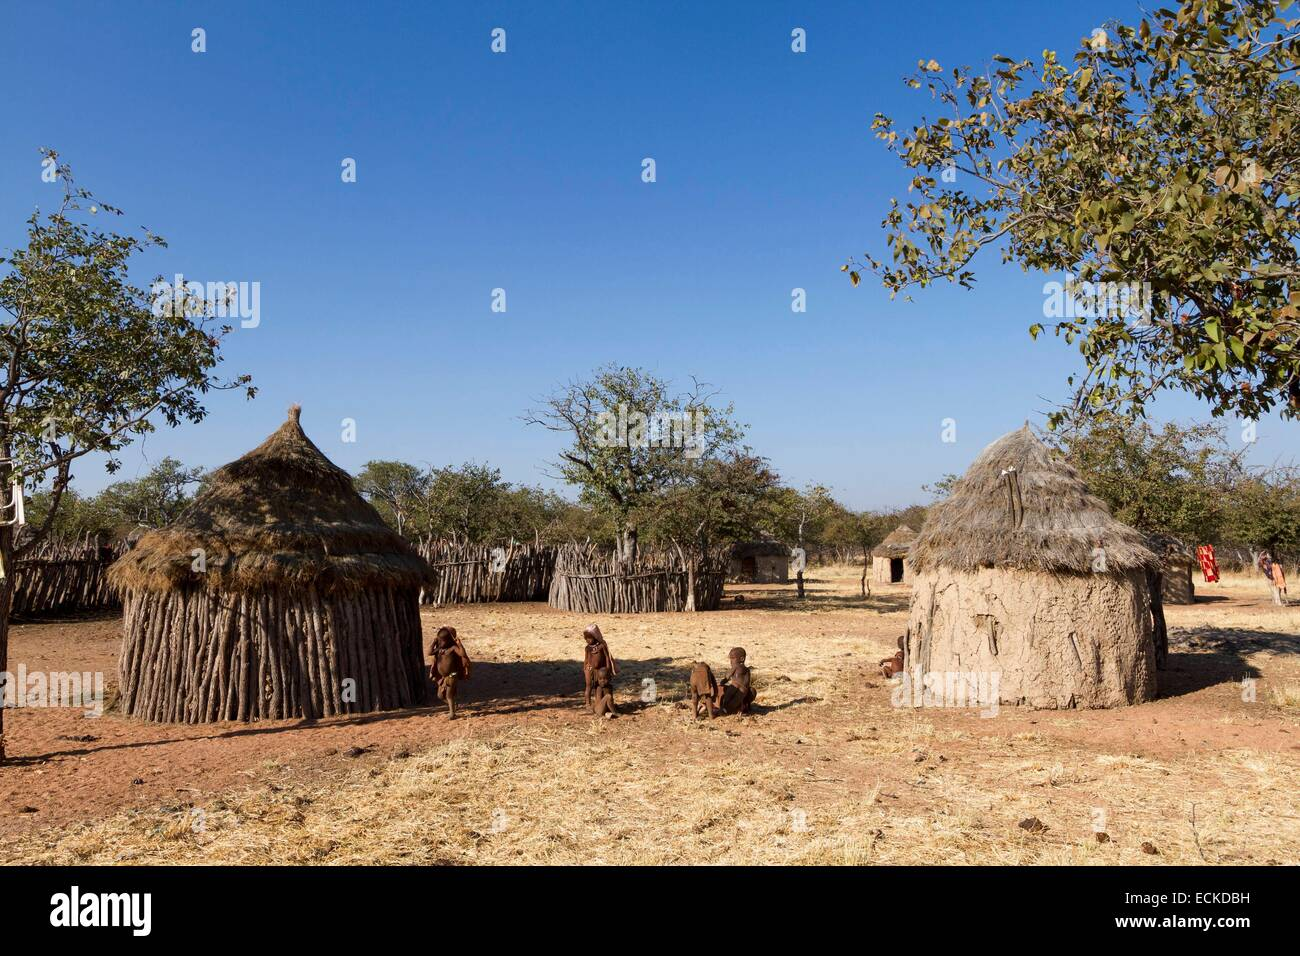 Namibia, Kunene region, Kaokoland, Himba village near Kamanjab, Himba children in front of a hut Stock Photo